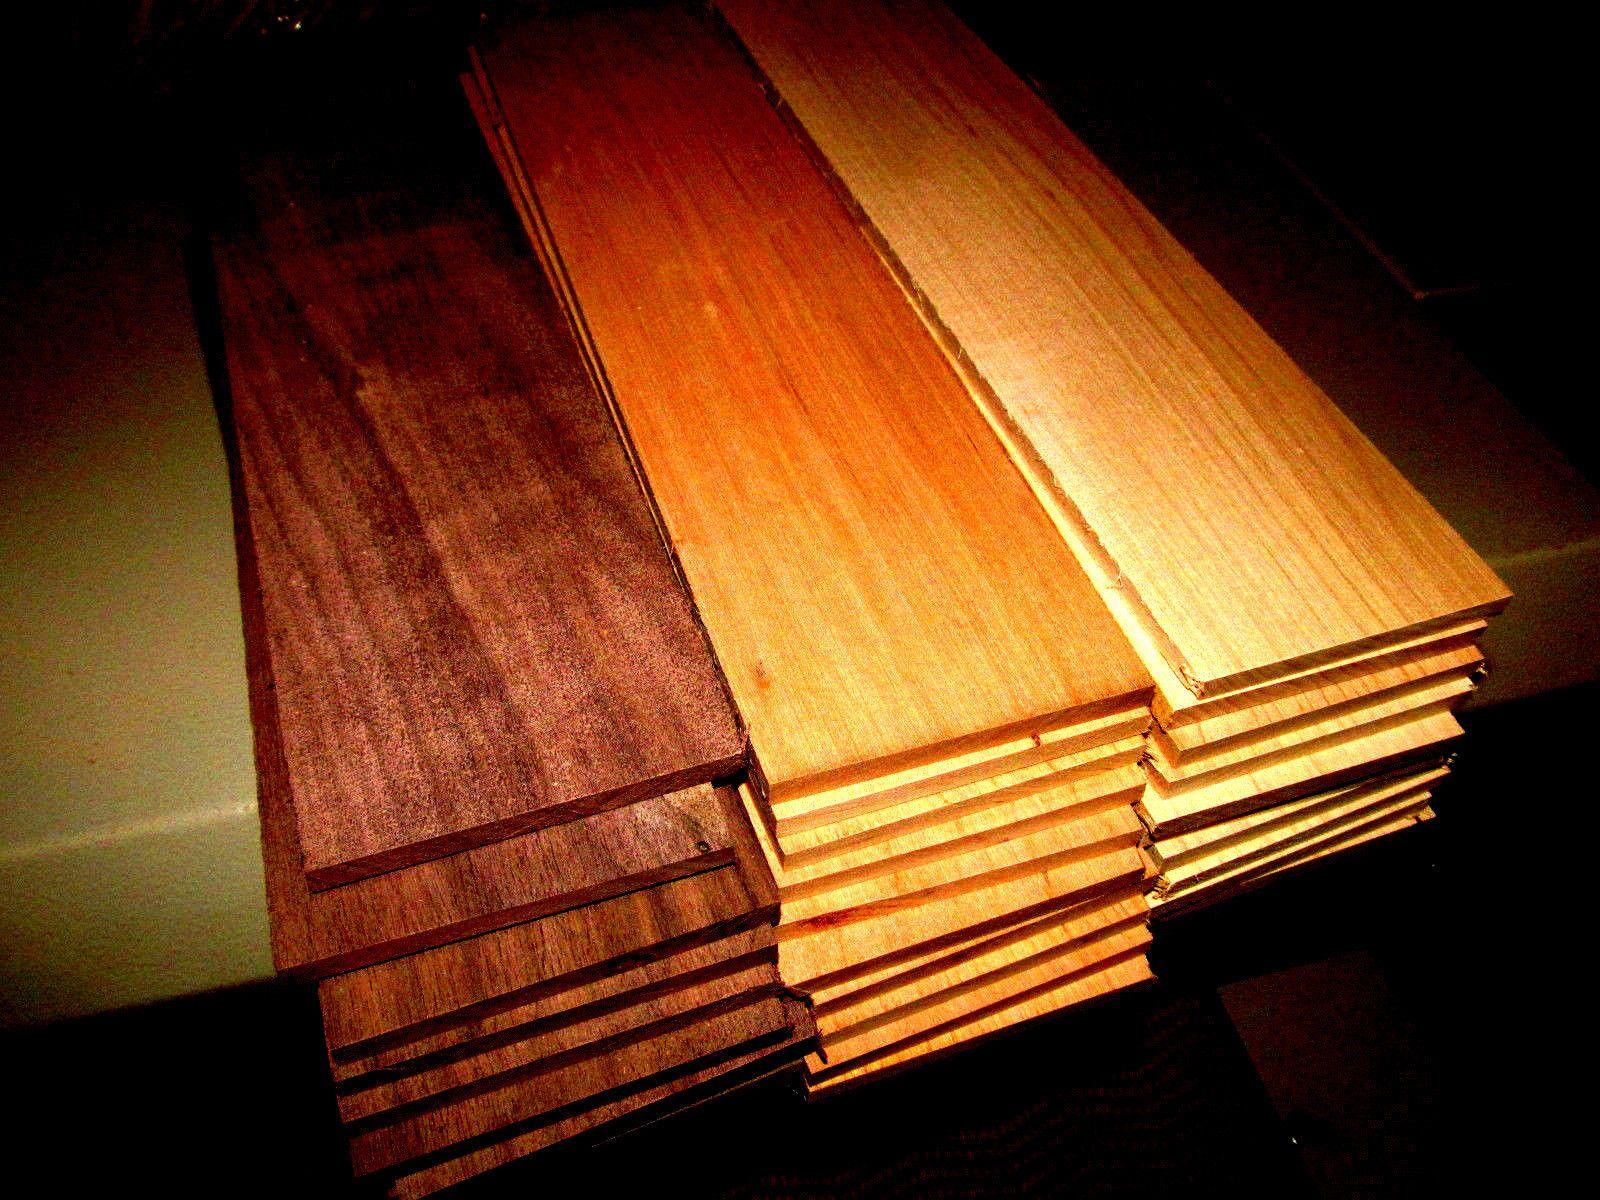 Mastercraft 1 X 12 X 4 Red Oak Board Hardwood Lumber Red Oak Mastercraft